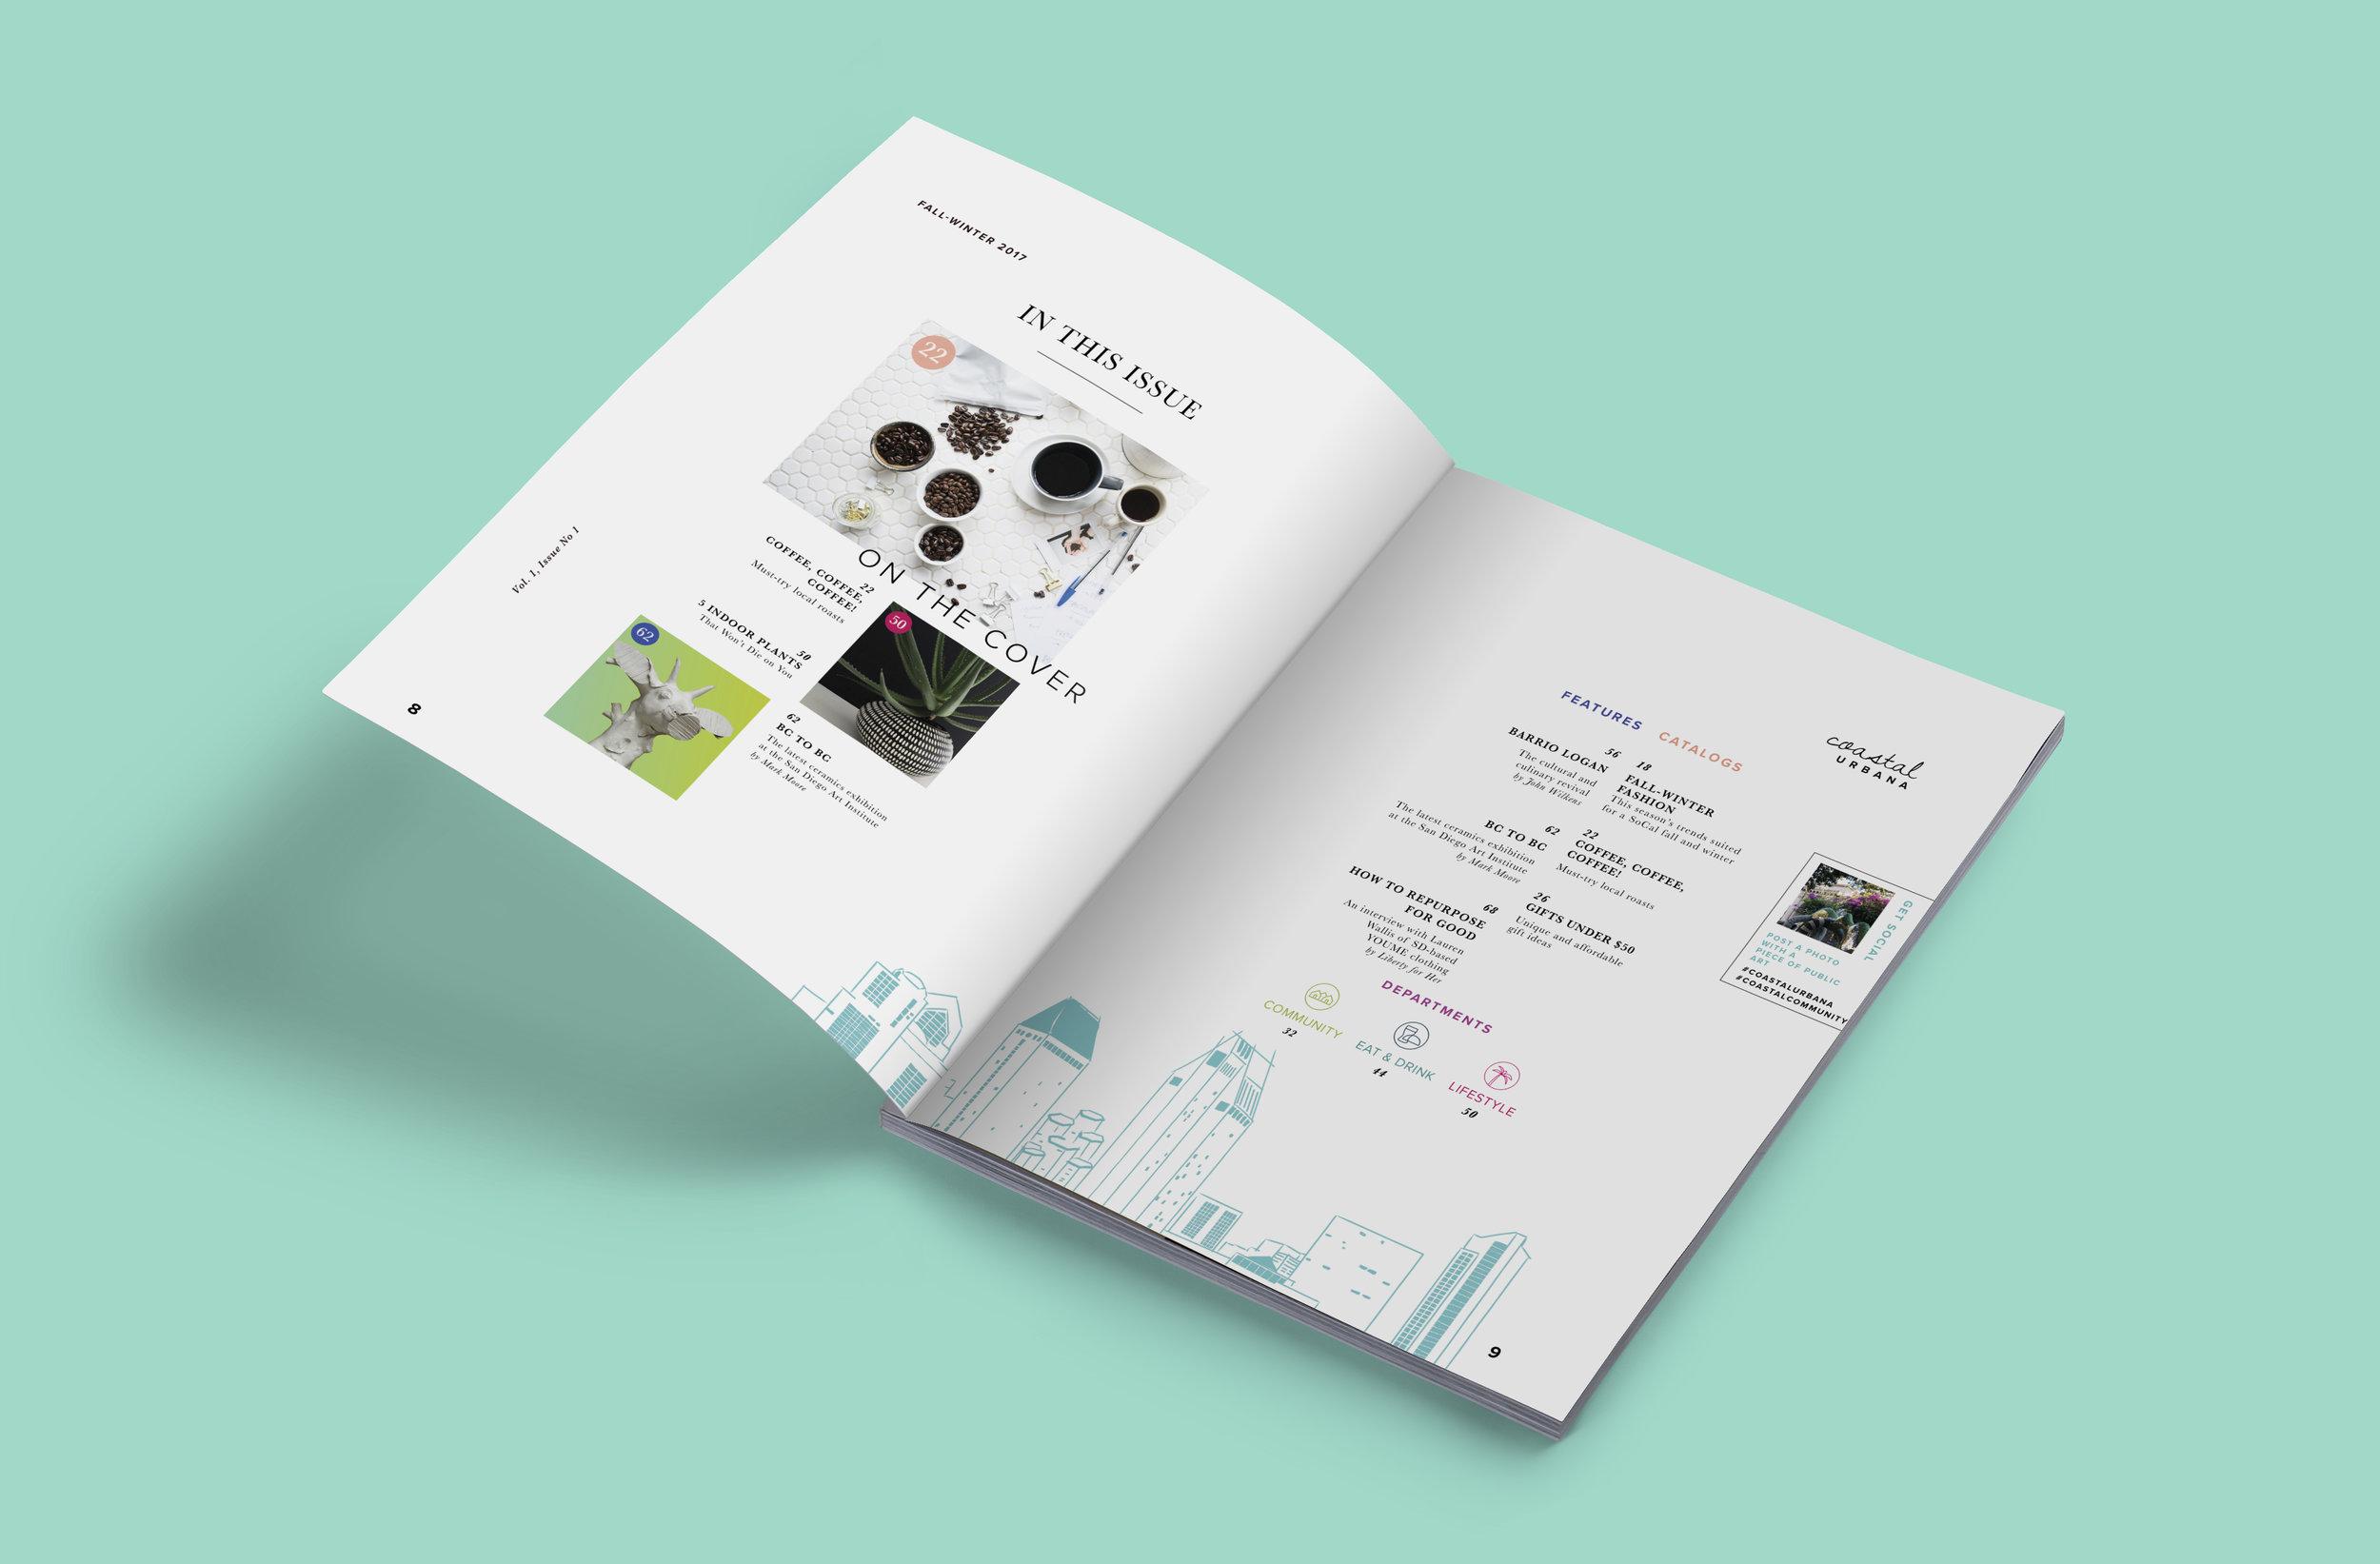 shadalene-design-coastal-urbana-contents